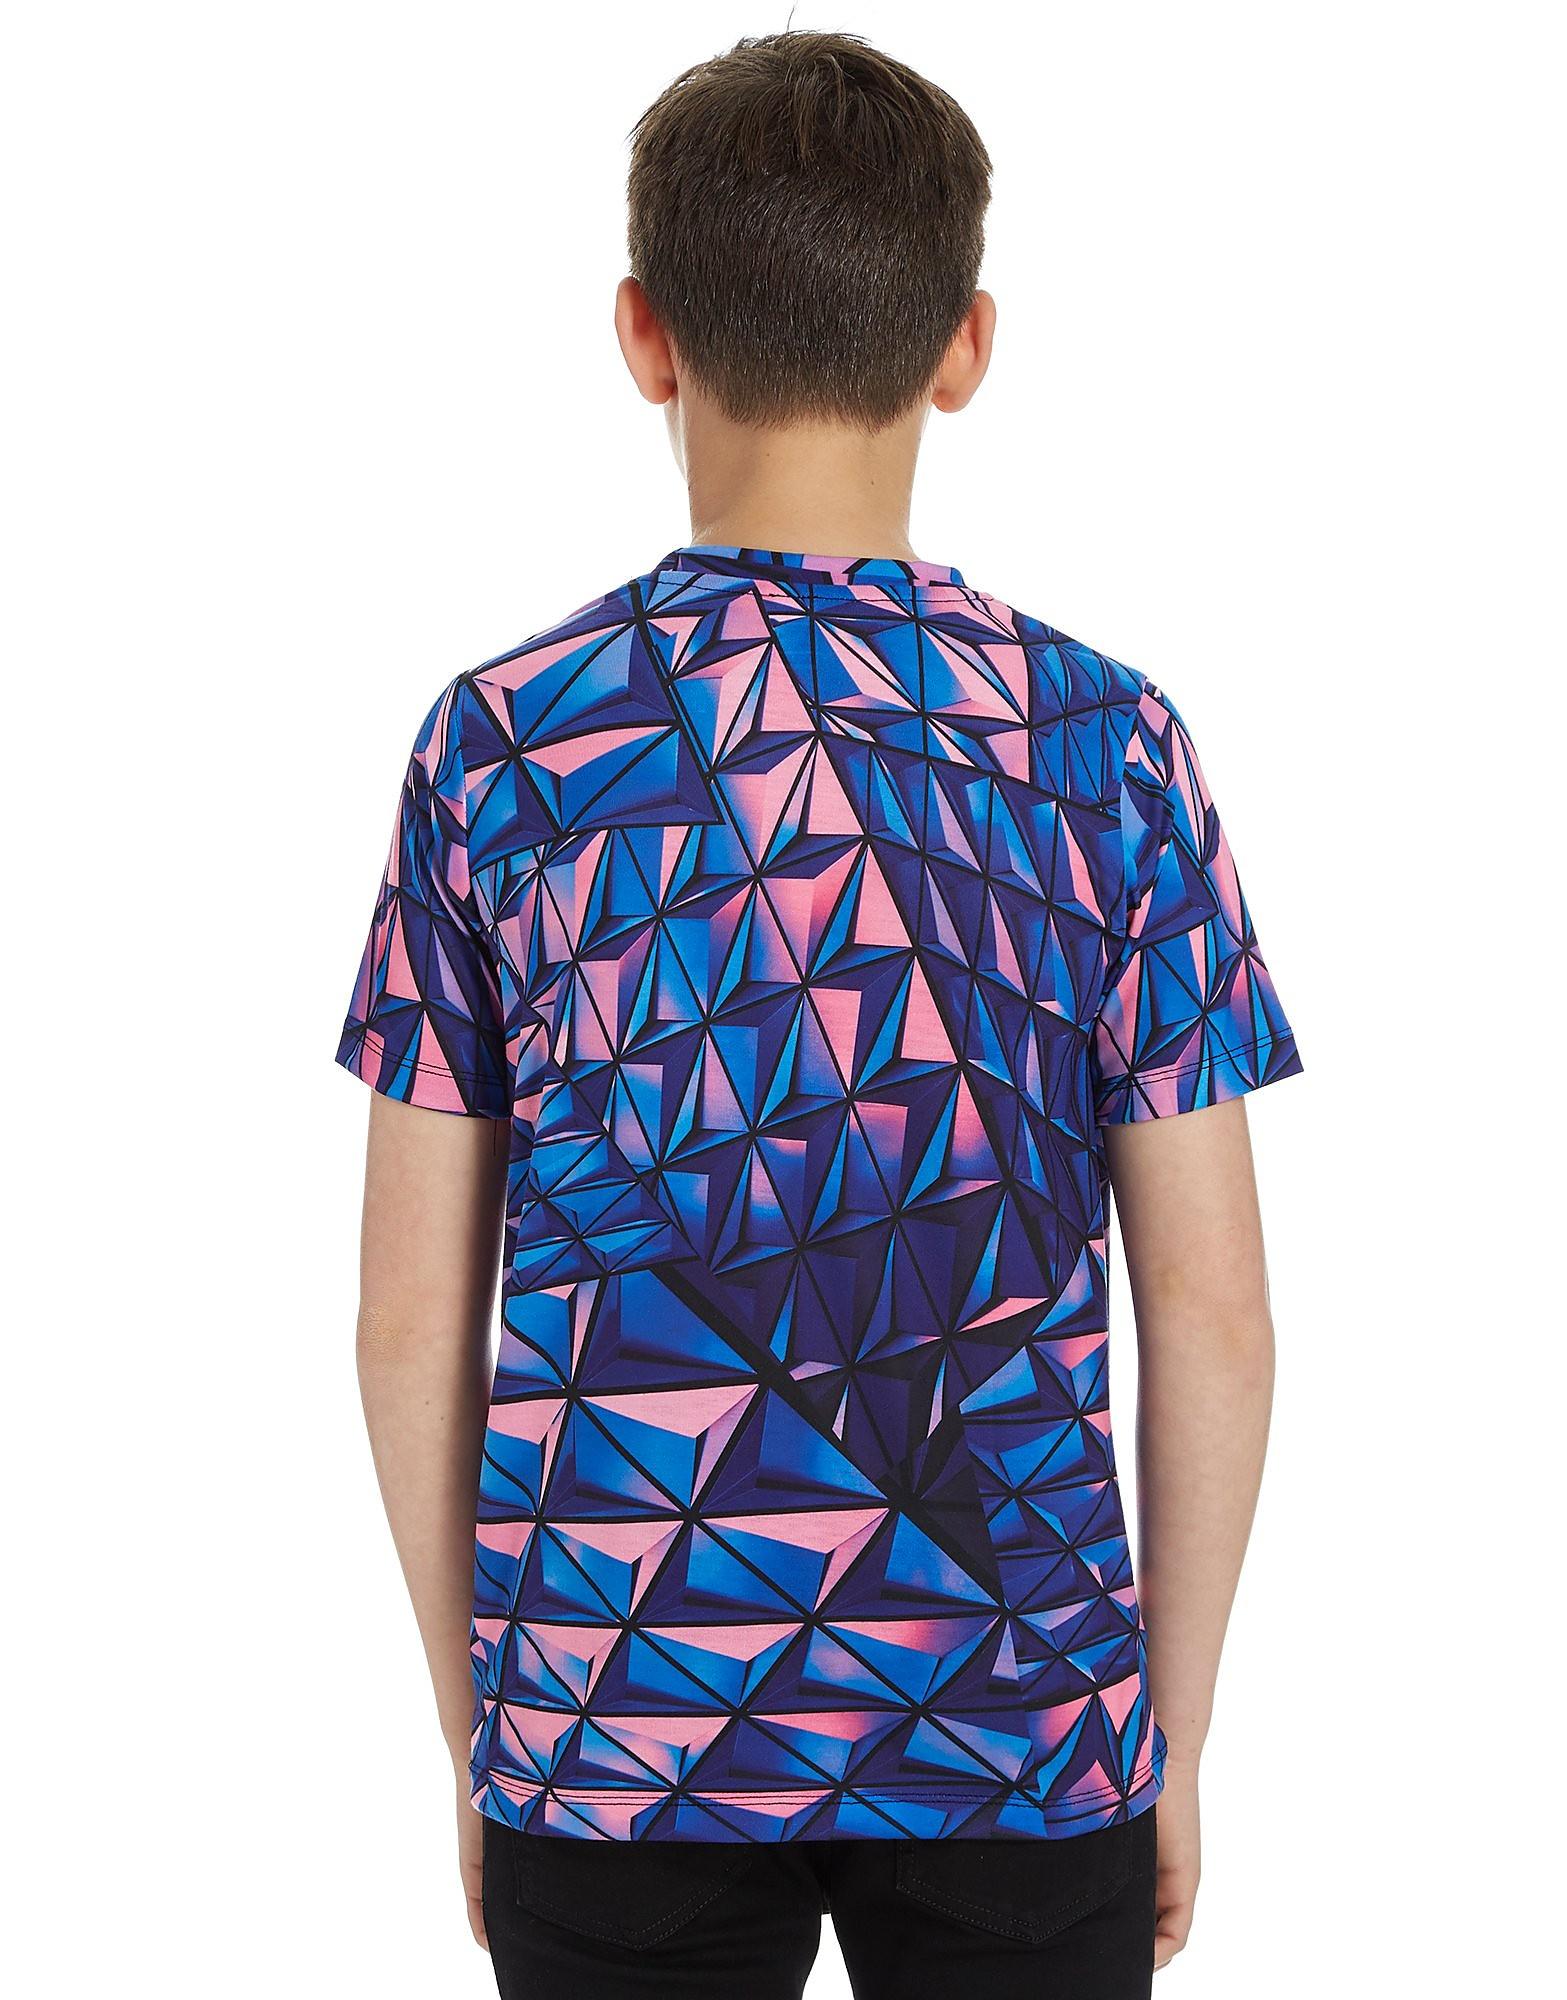 Hype Pyramid T-Shirt Junior